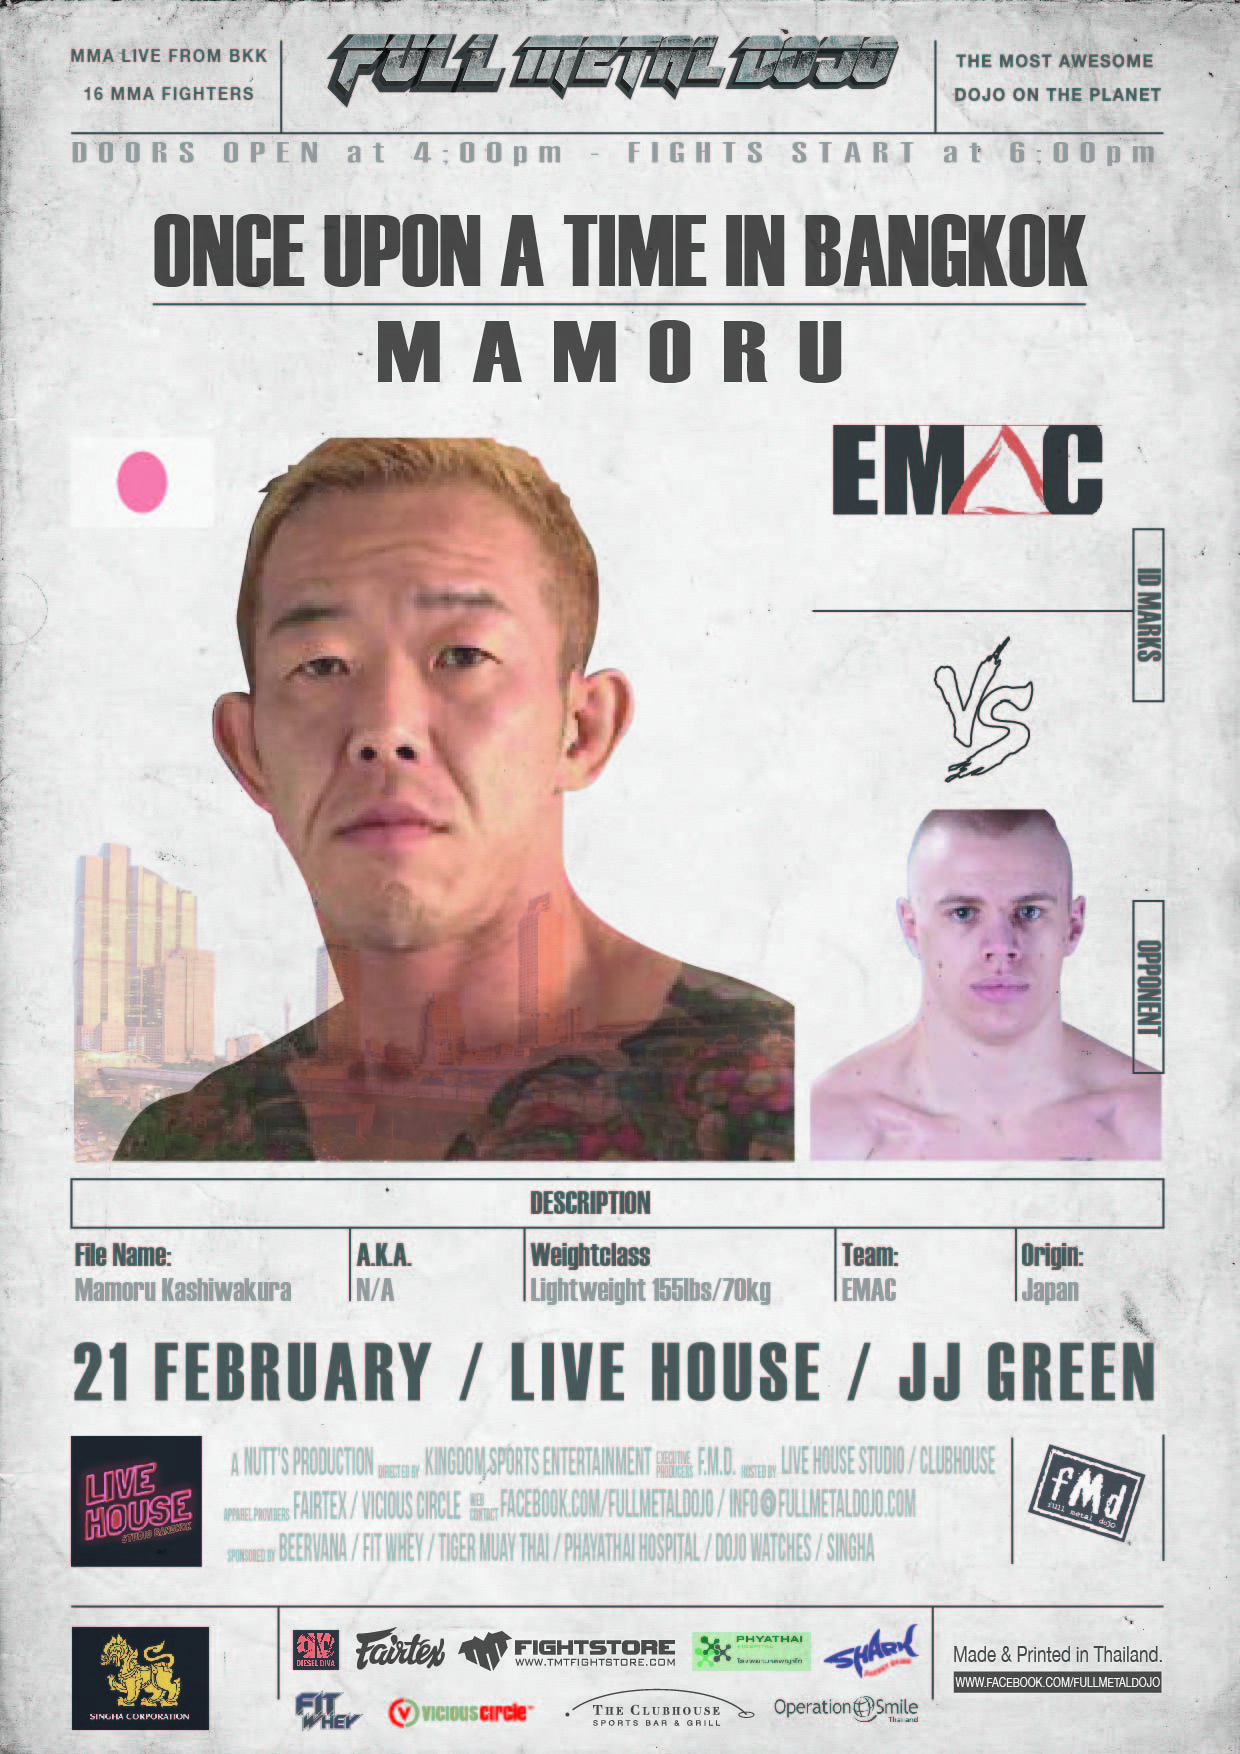 Mamoru Kashiwakura FMD4 MMA Fighter